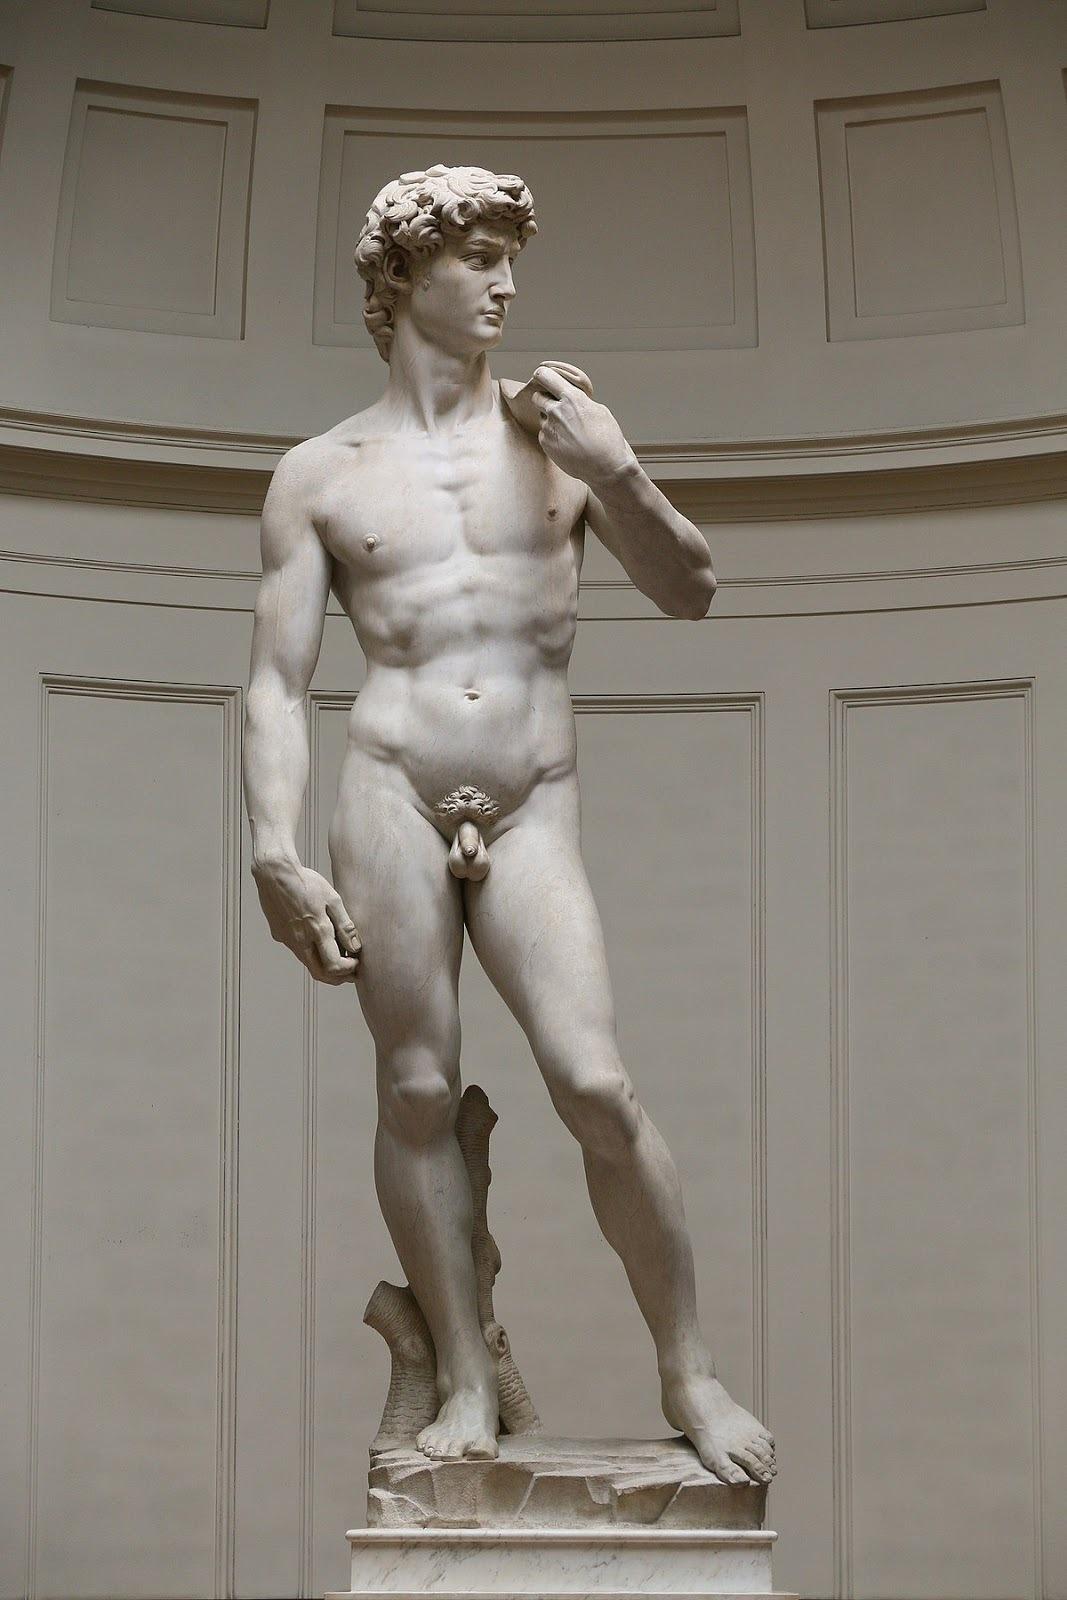 Michelangelo Buonarroti (1475-1564). David. 1501-1504. Marble. Galleria dell'Accademia, Florence, Italy.